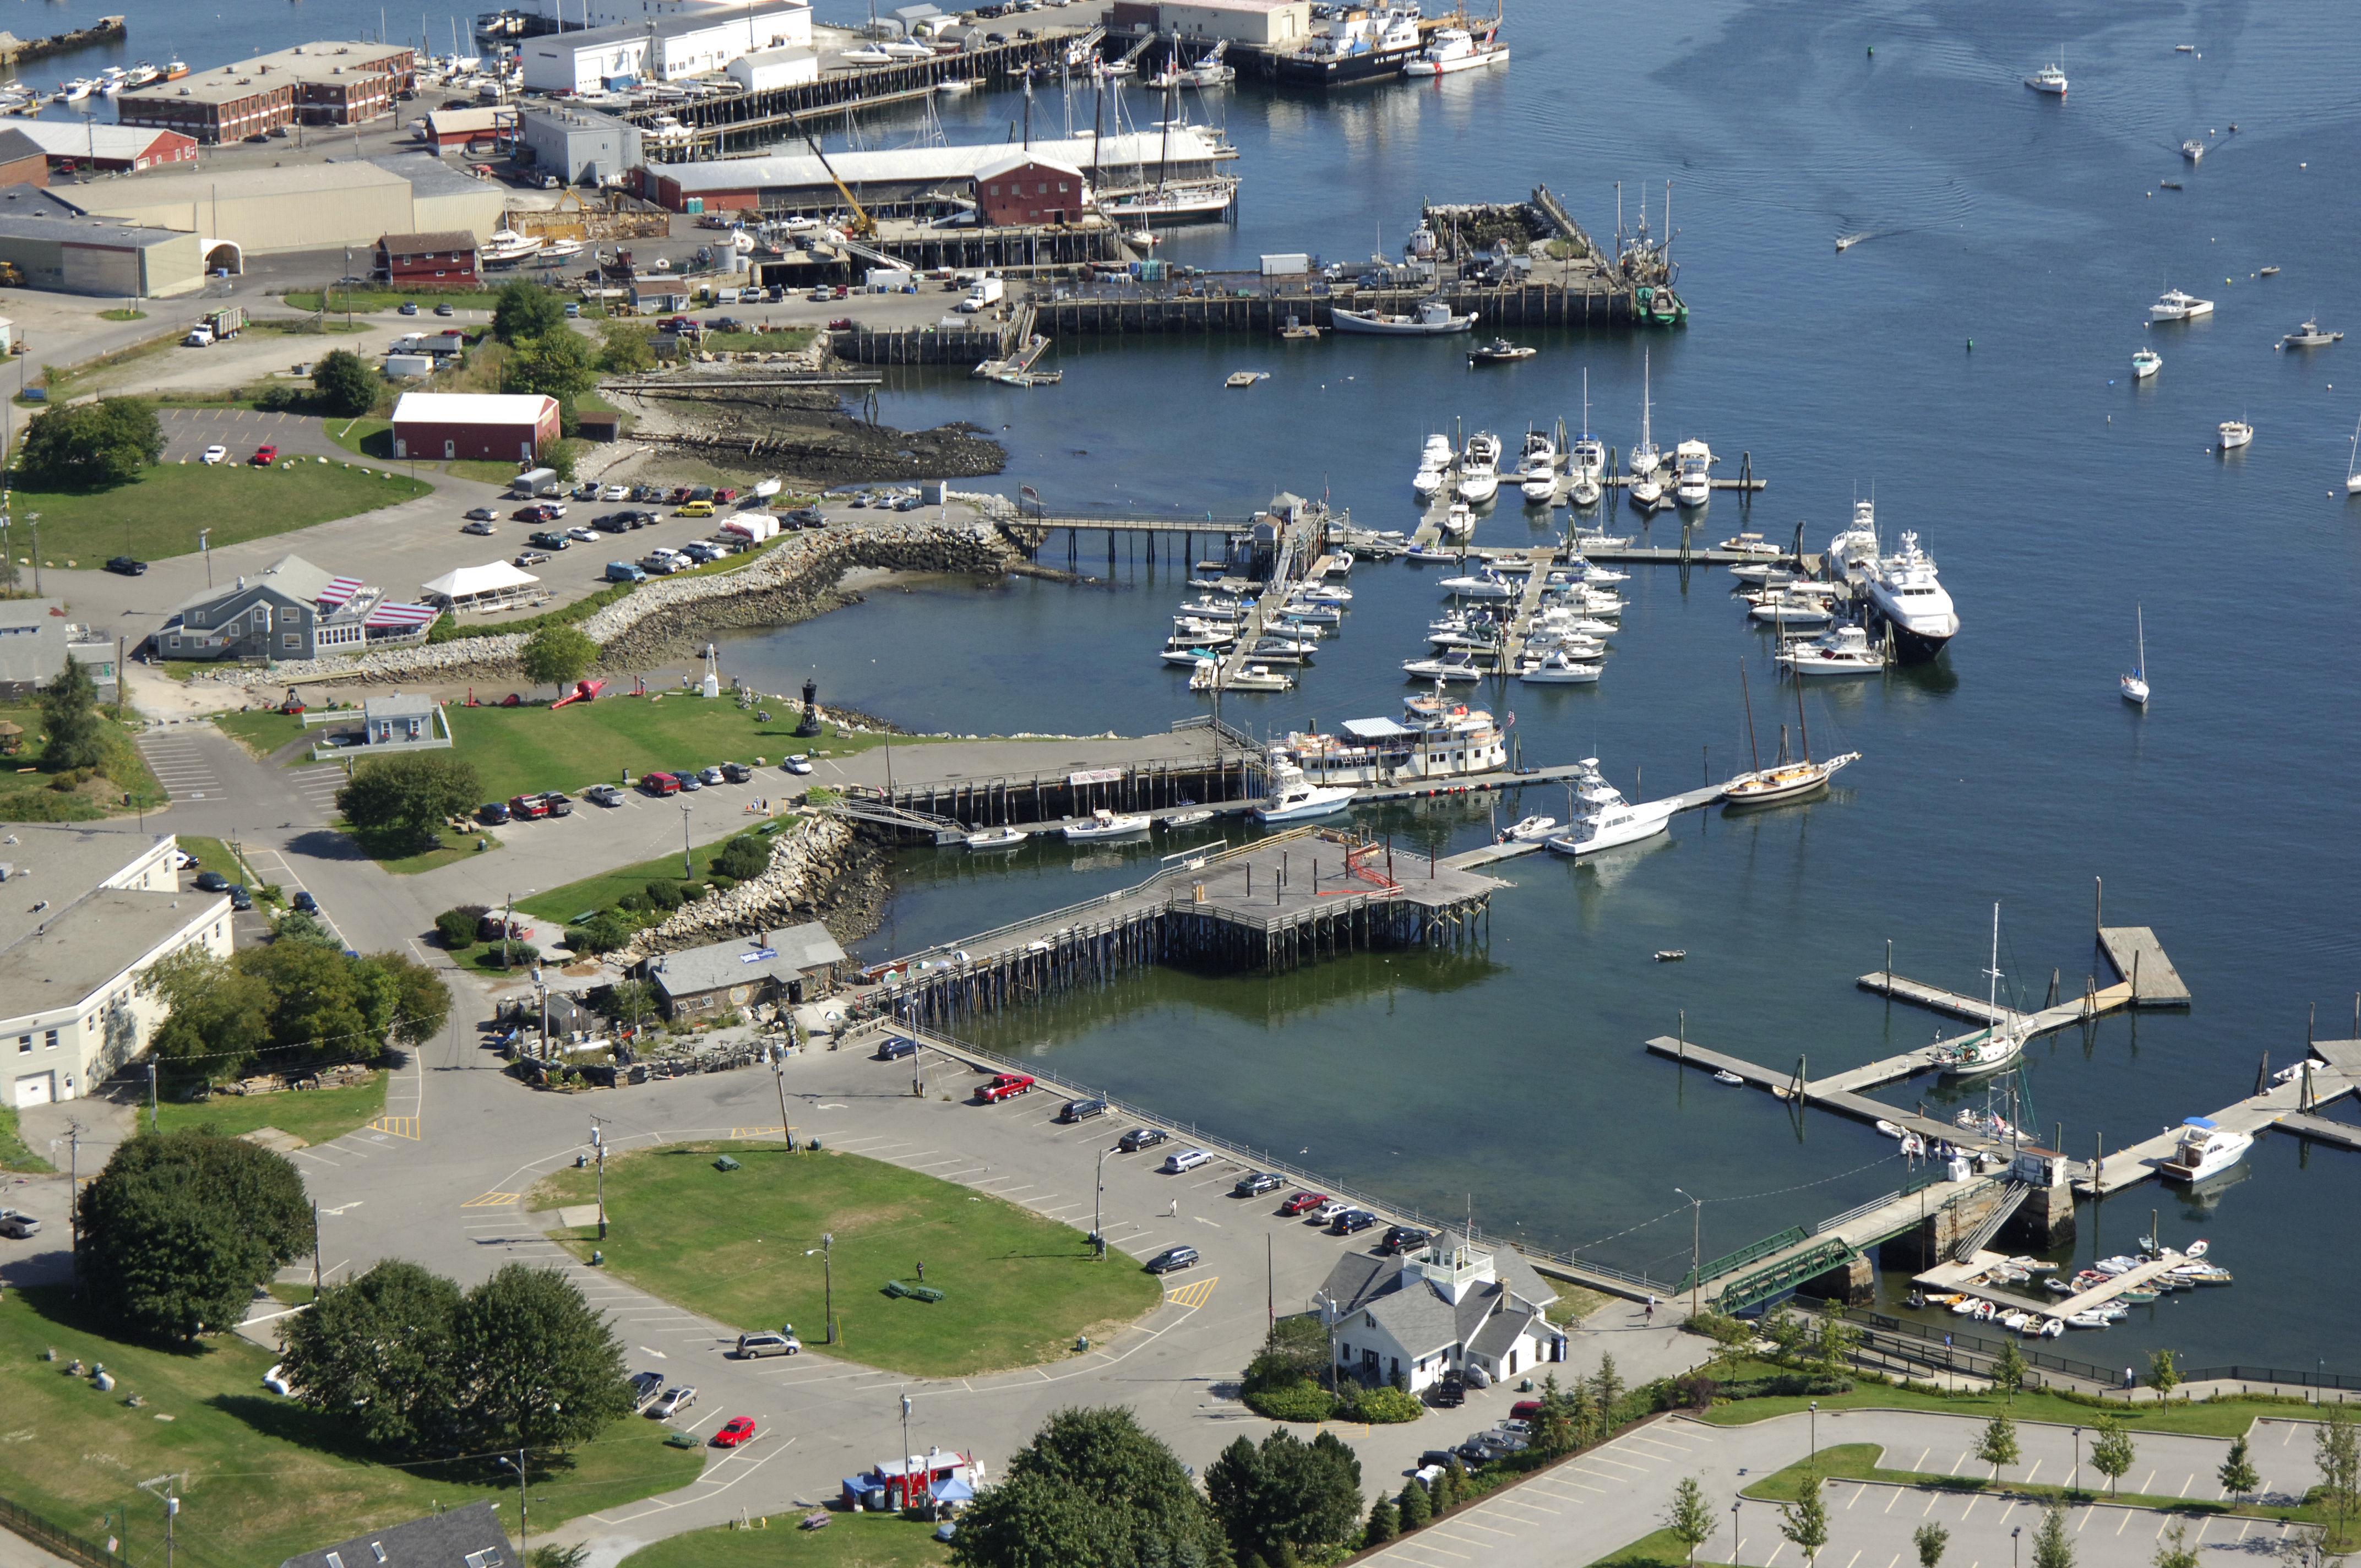 Landings Marina in Rockland, ME, United States - Marina